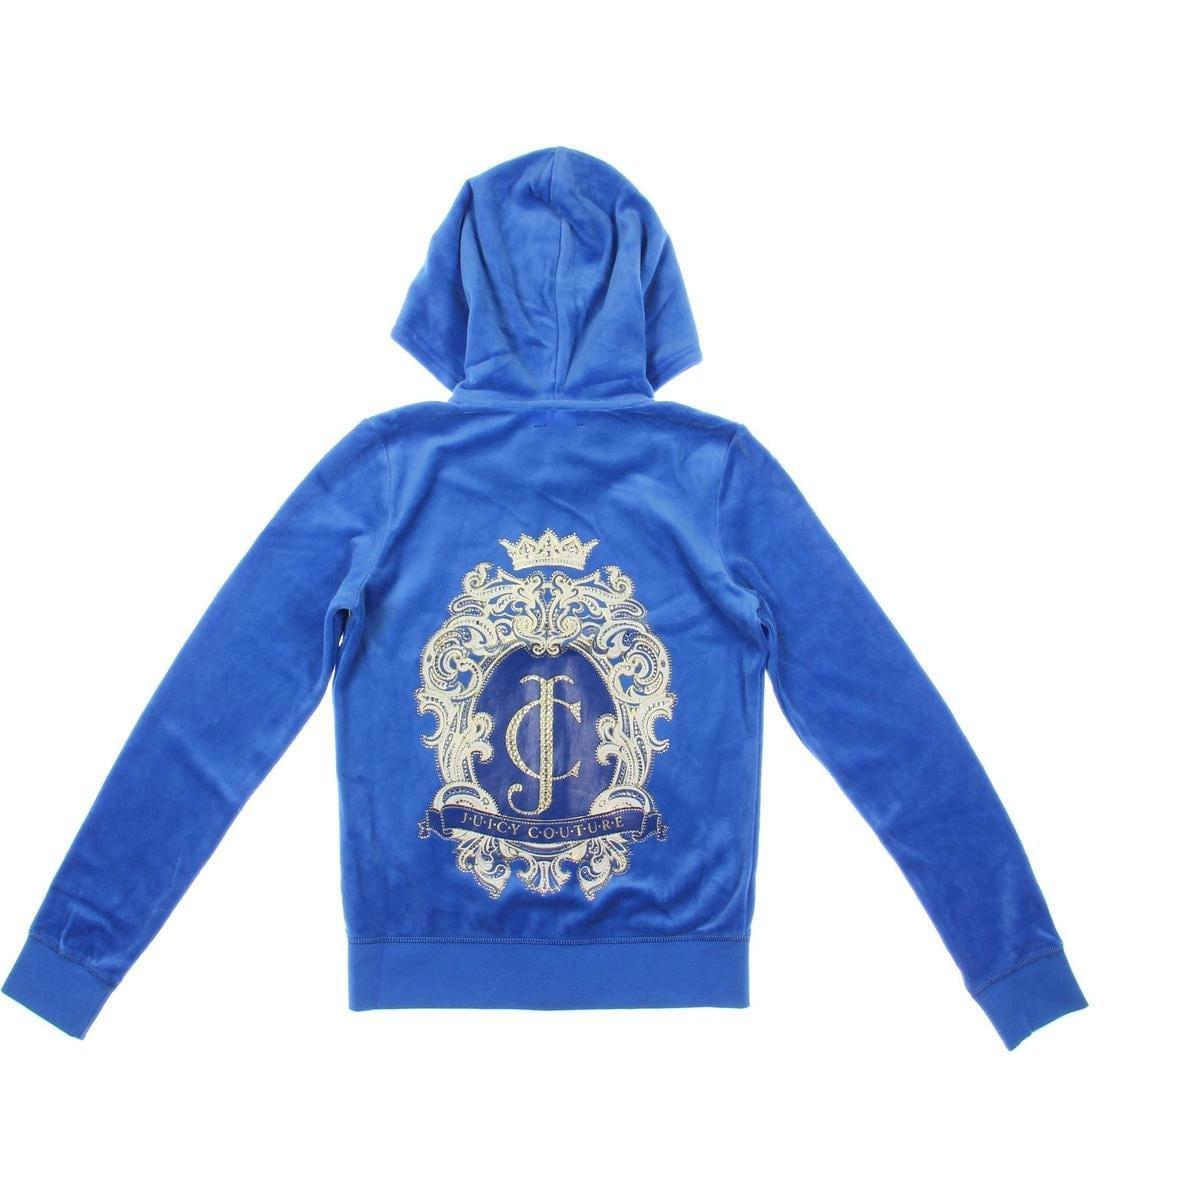 628c2c712 Juicy Couture Black Label Girls Logo Ornate Cameo Jacket Velour - 14